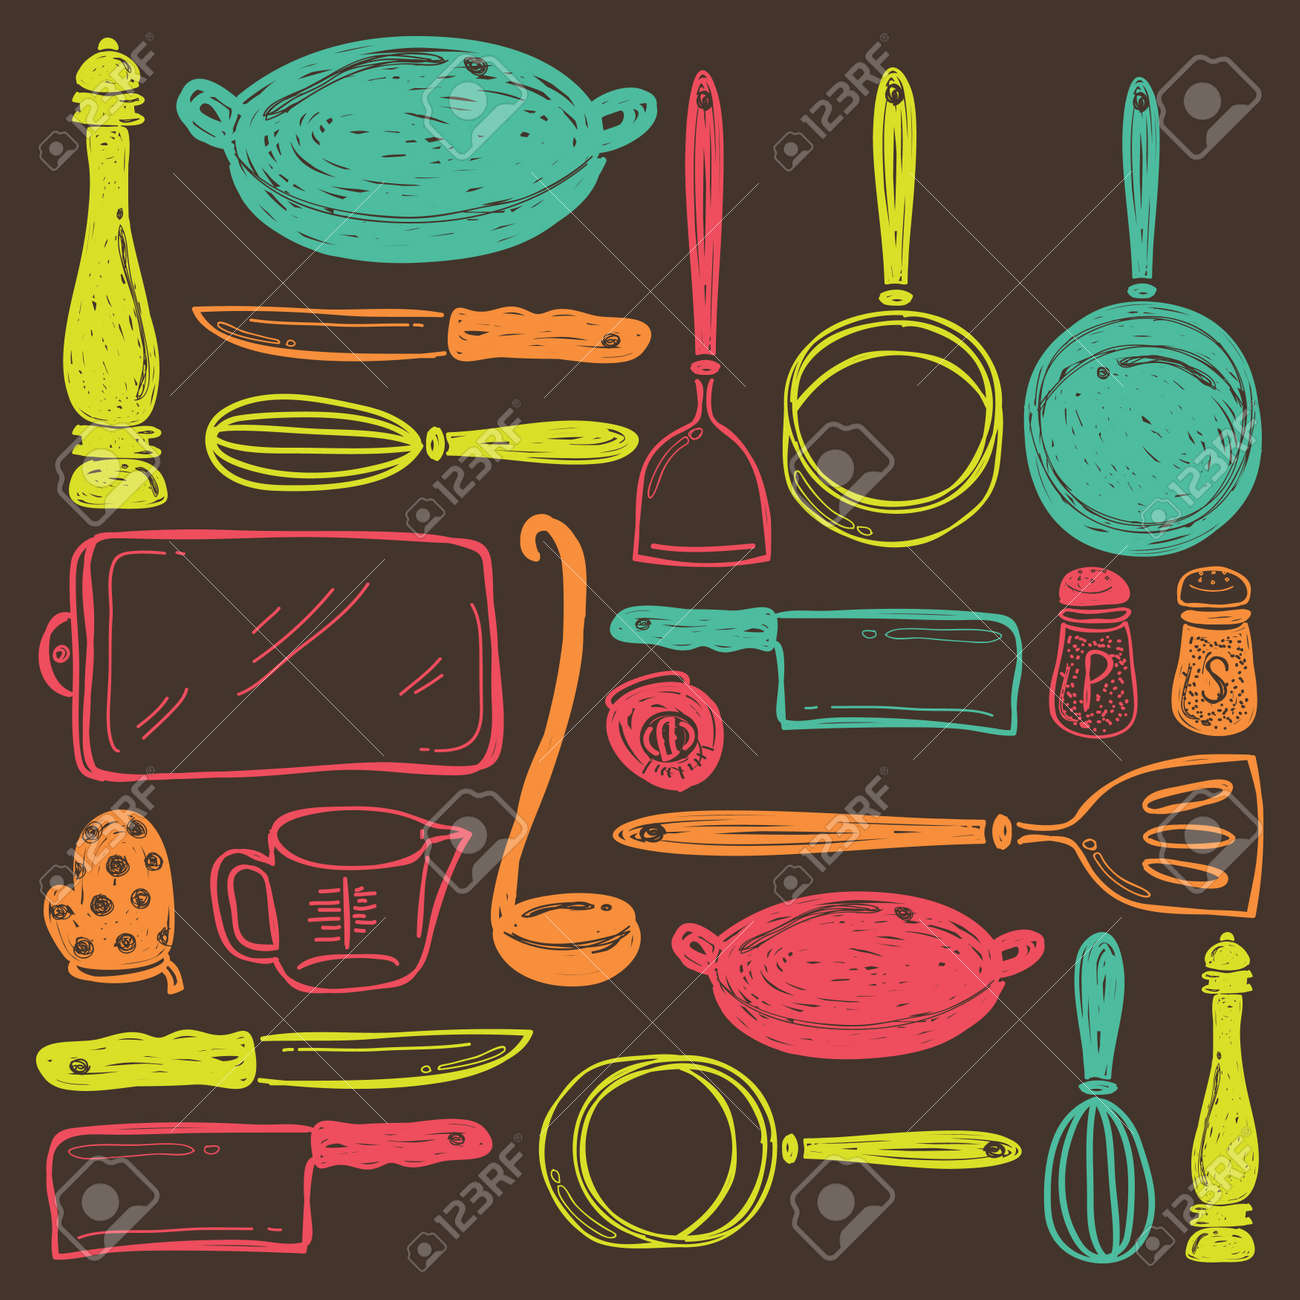 seamless cooking utensils - 17432732